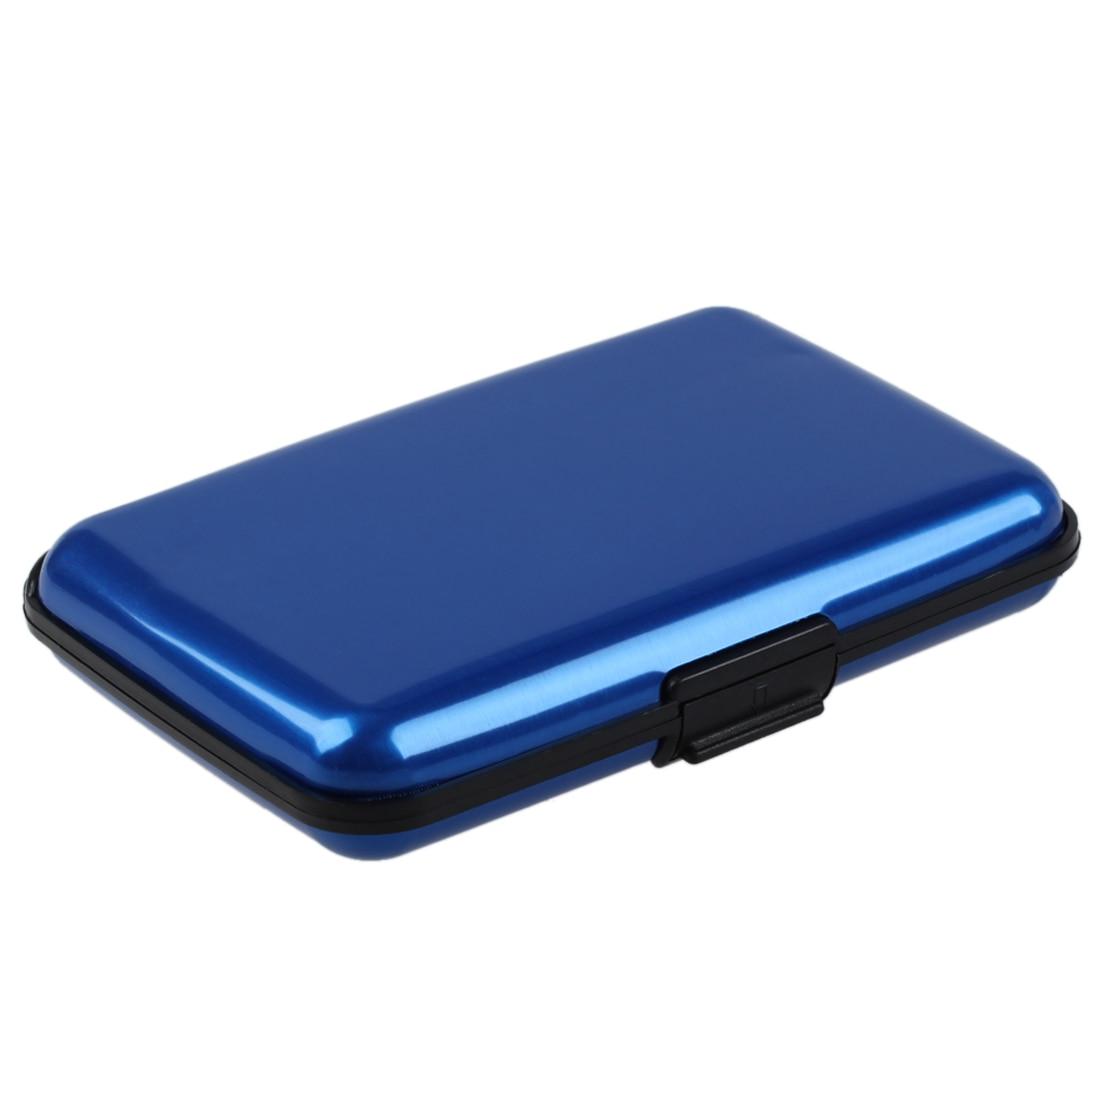 Waterproof Business Id Credit Card Wallet Holder Aluminum Metal Case Box (Random Color)